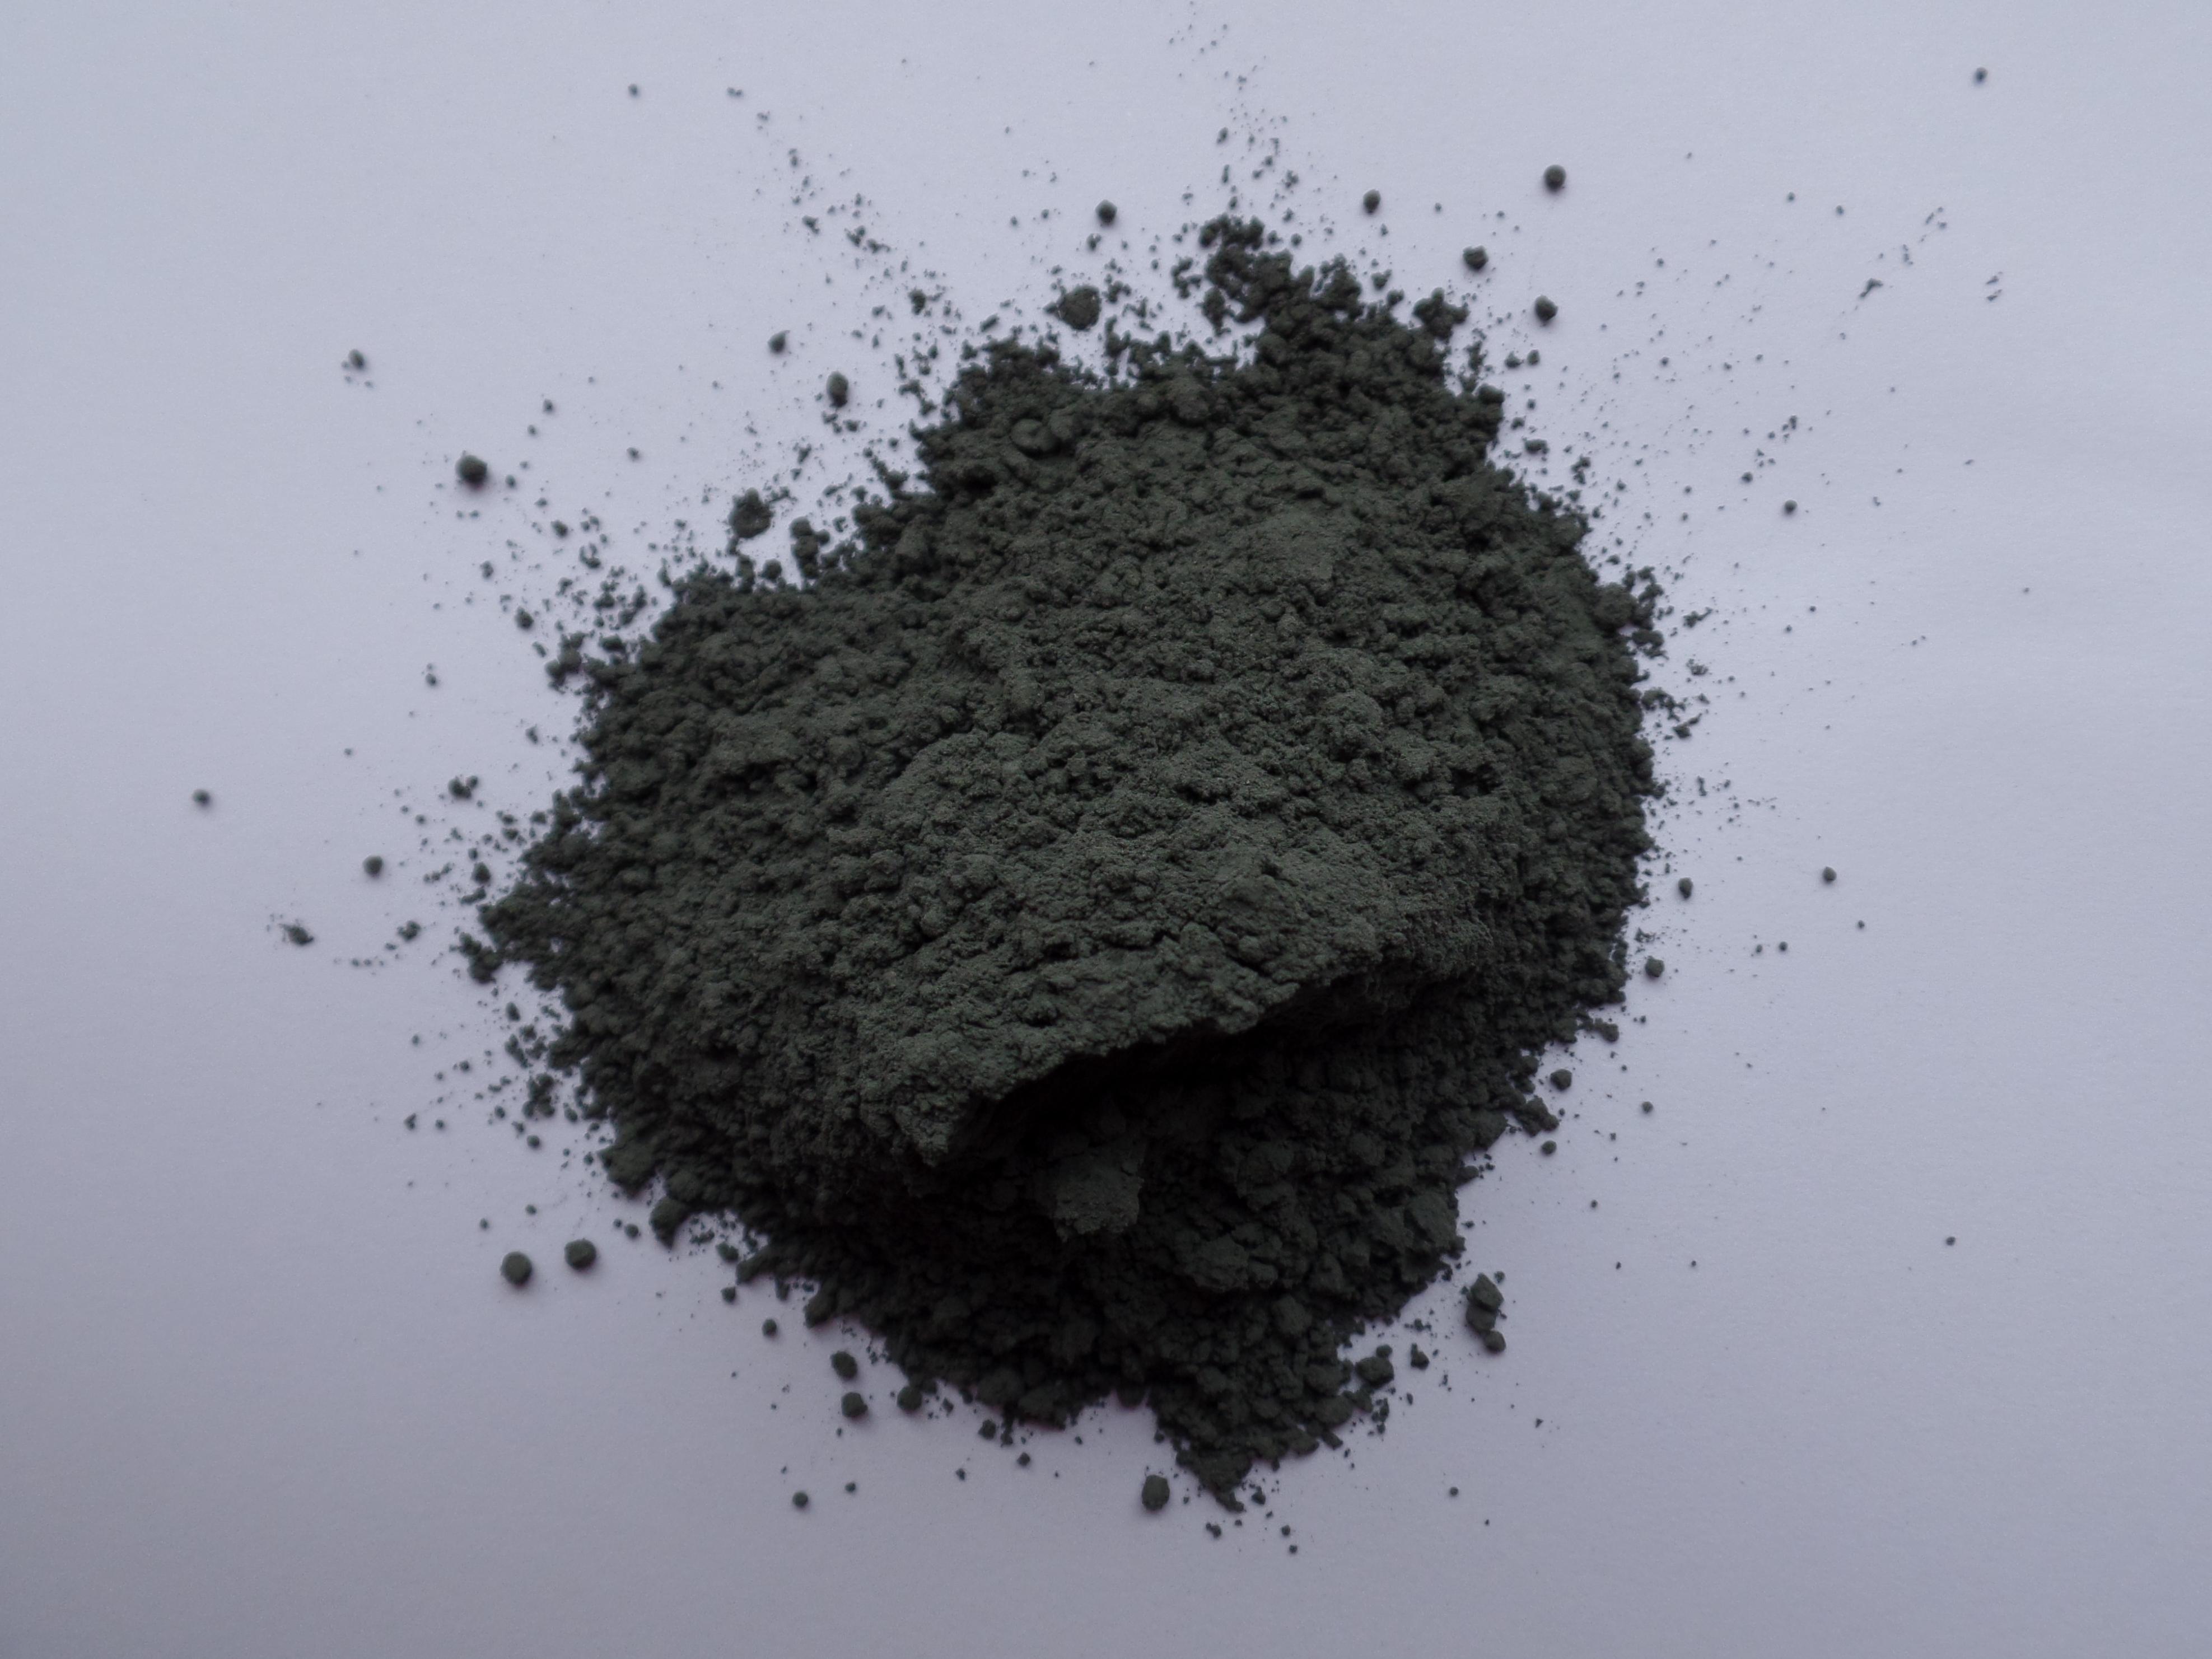 File:Nickel(III) oxide powder.jpg - Wikimedia Commons